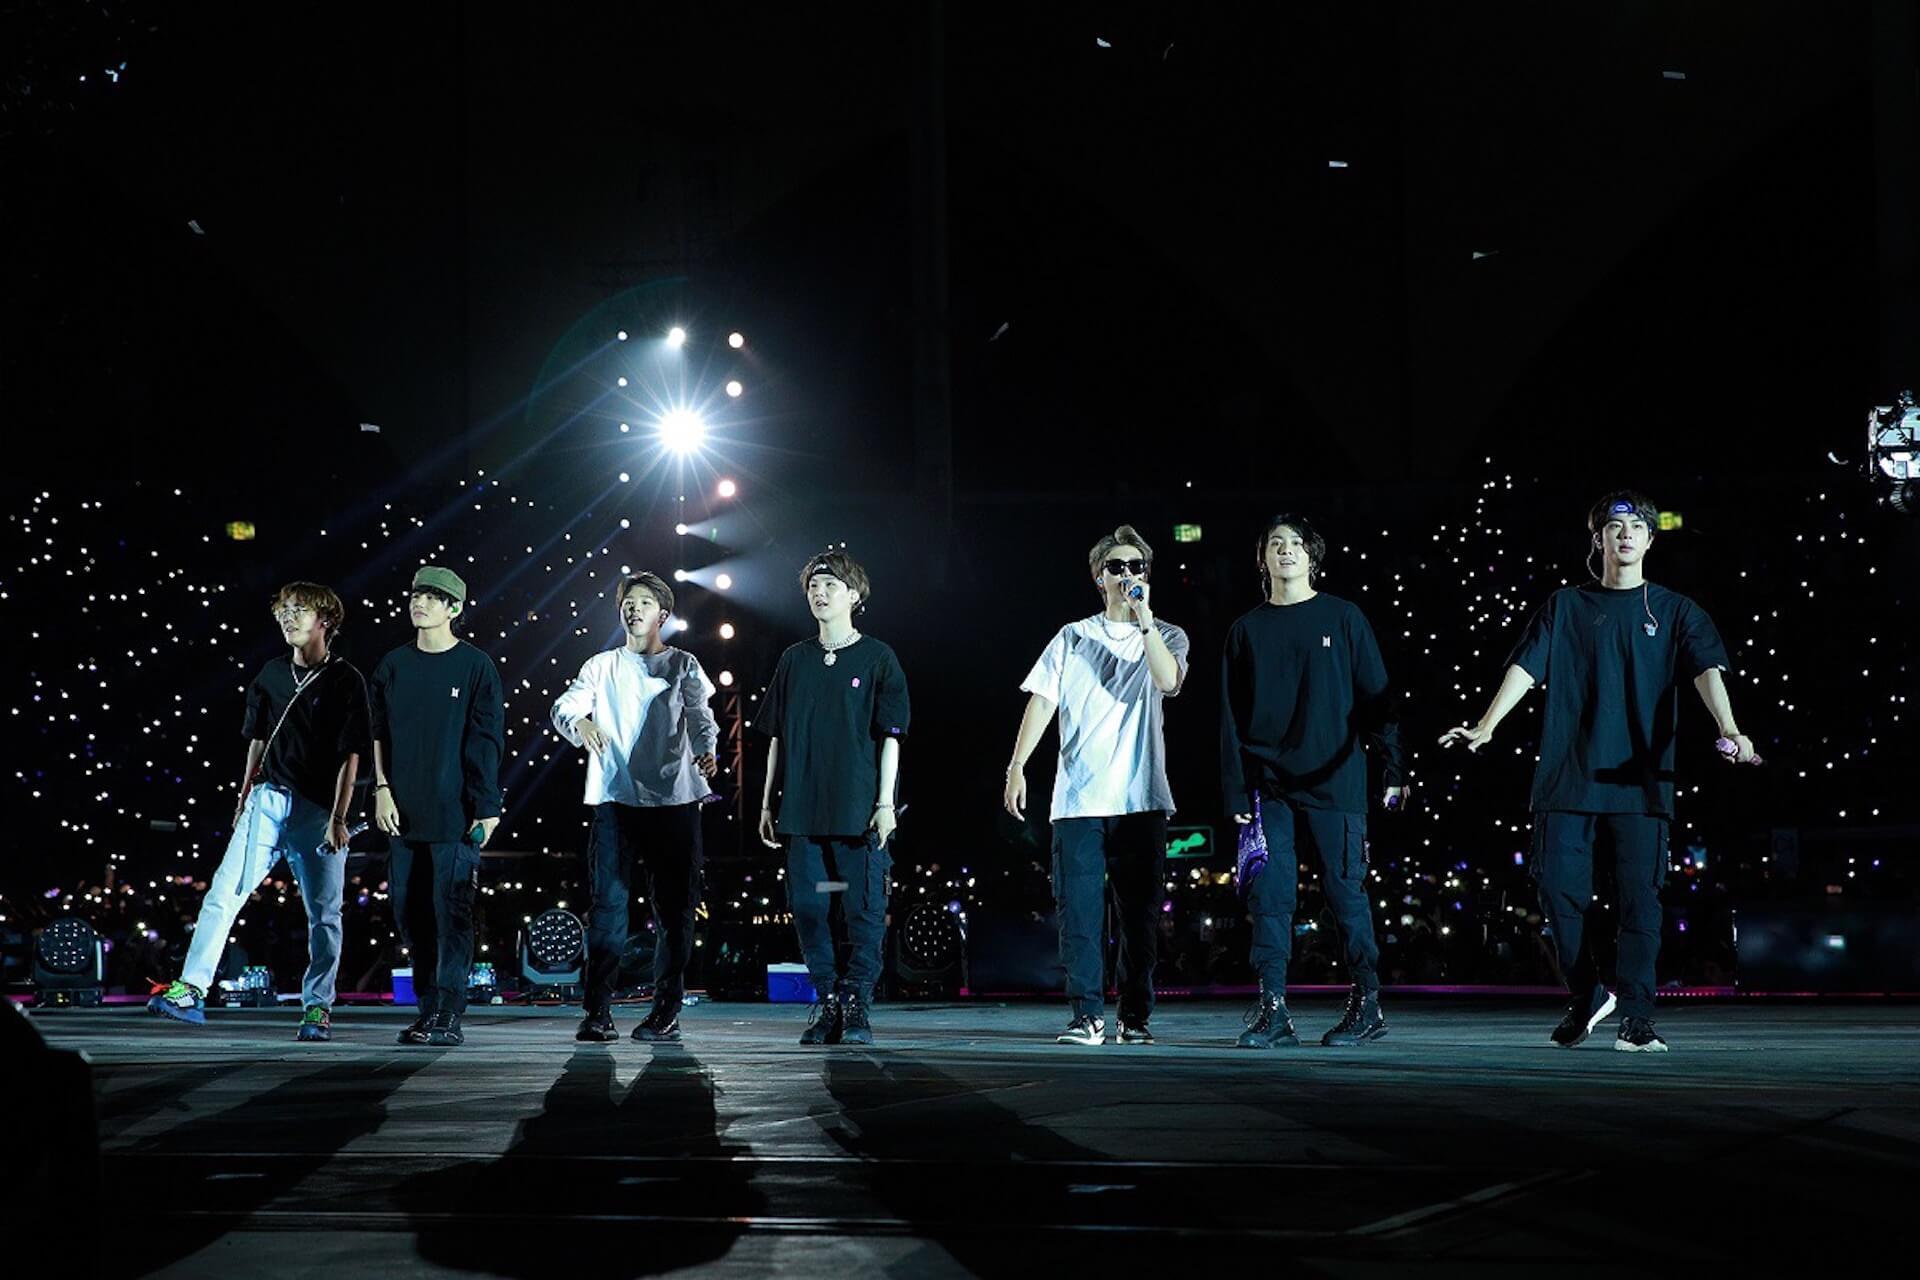 BTS、海外アーティスト初サウジアラビアのスタジアム単独コンサート開催!全世界のファンと一つになった歴史的瞬間 music191011-bts-3